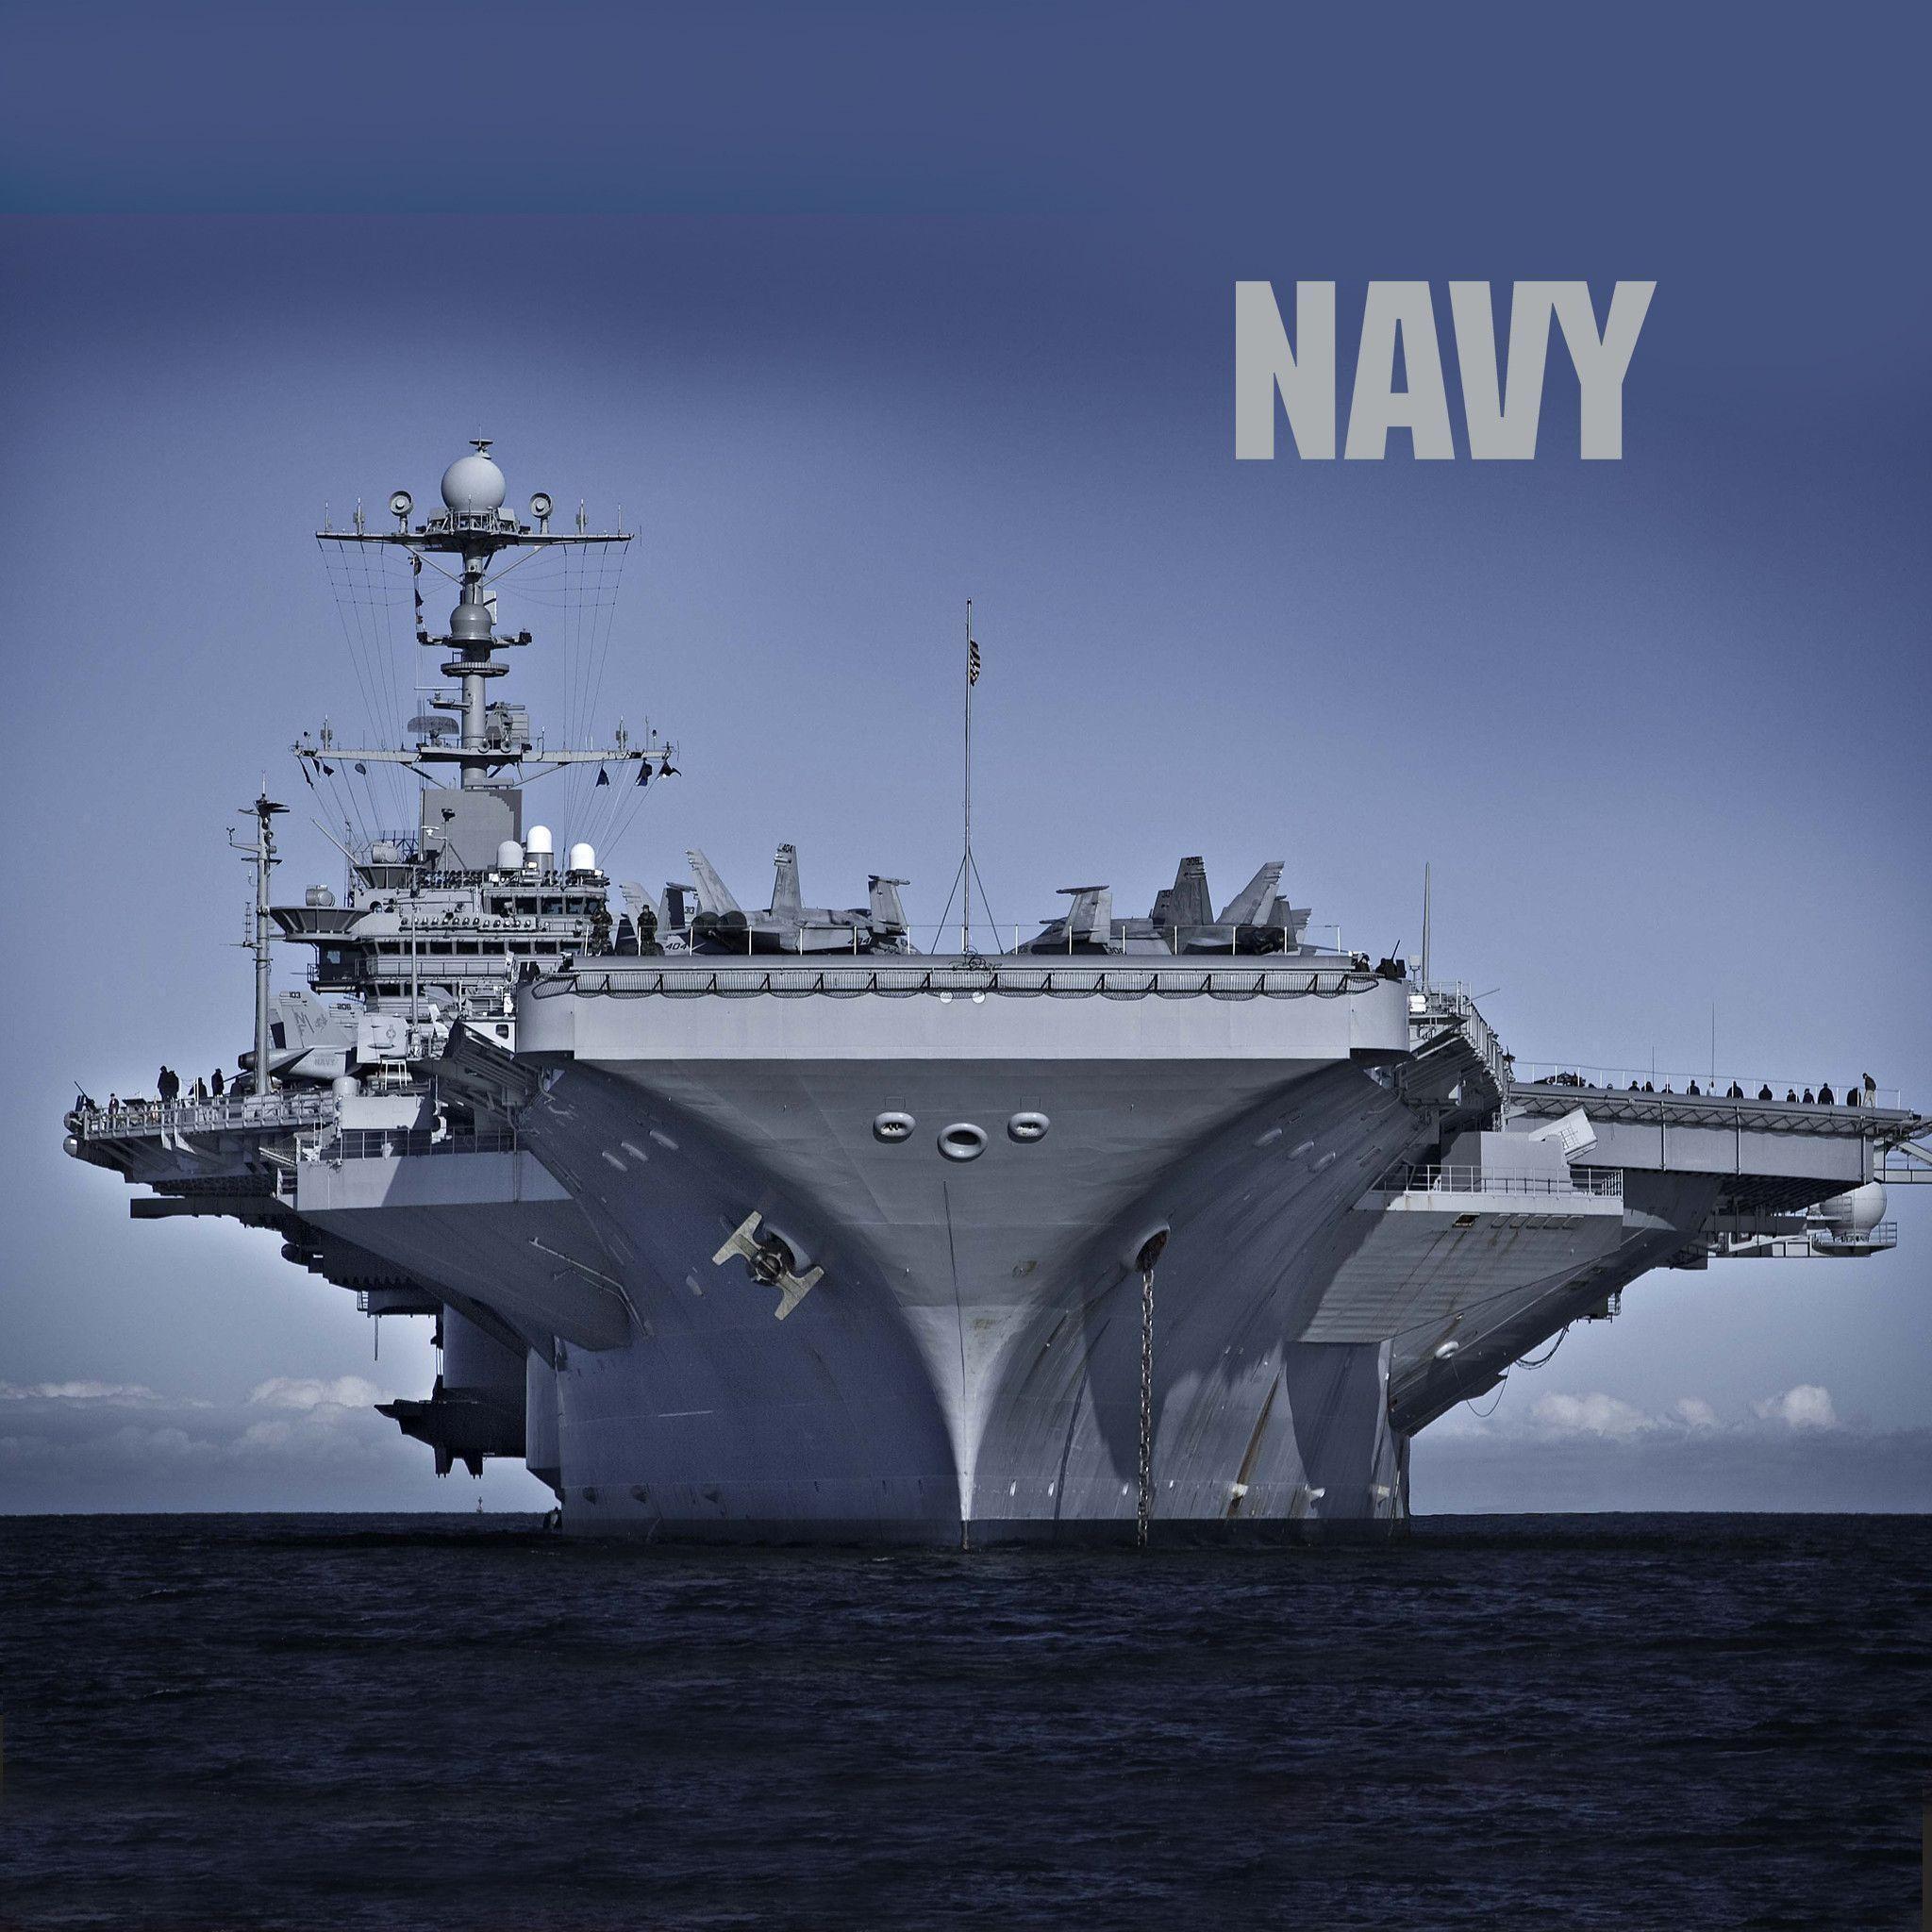 Us navy images logo wallpaper 54 images 2048x2048 us navy sky hd wallpaper voltagebd Images